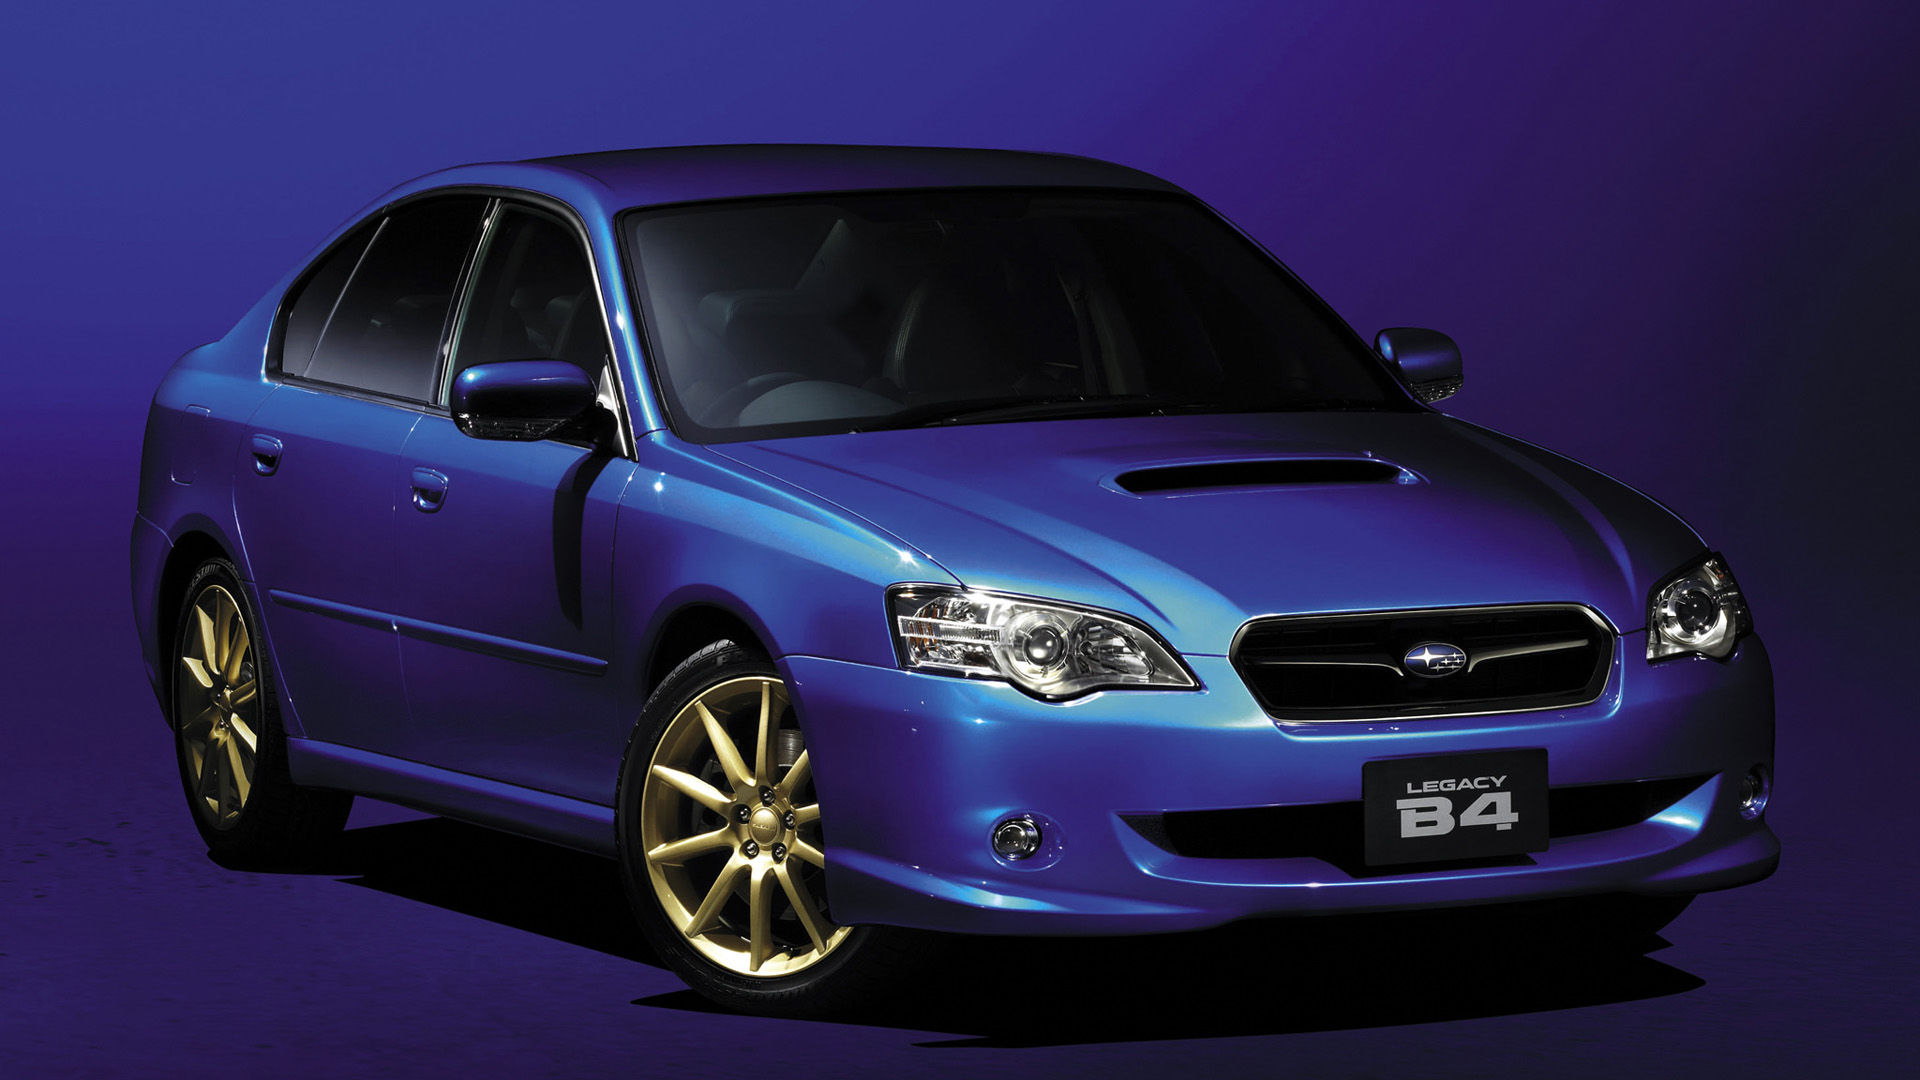 2005 Subaru Legacy GT Spec B